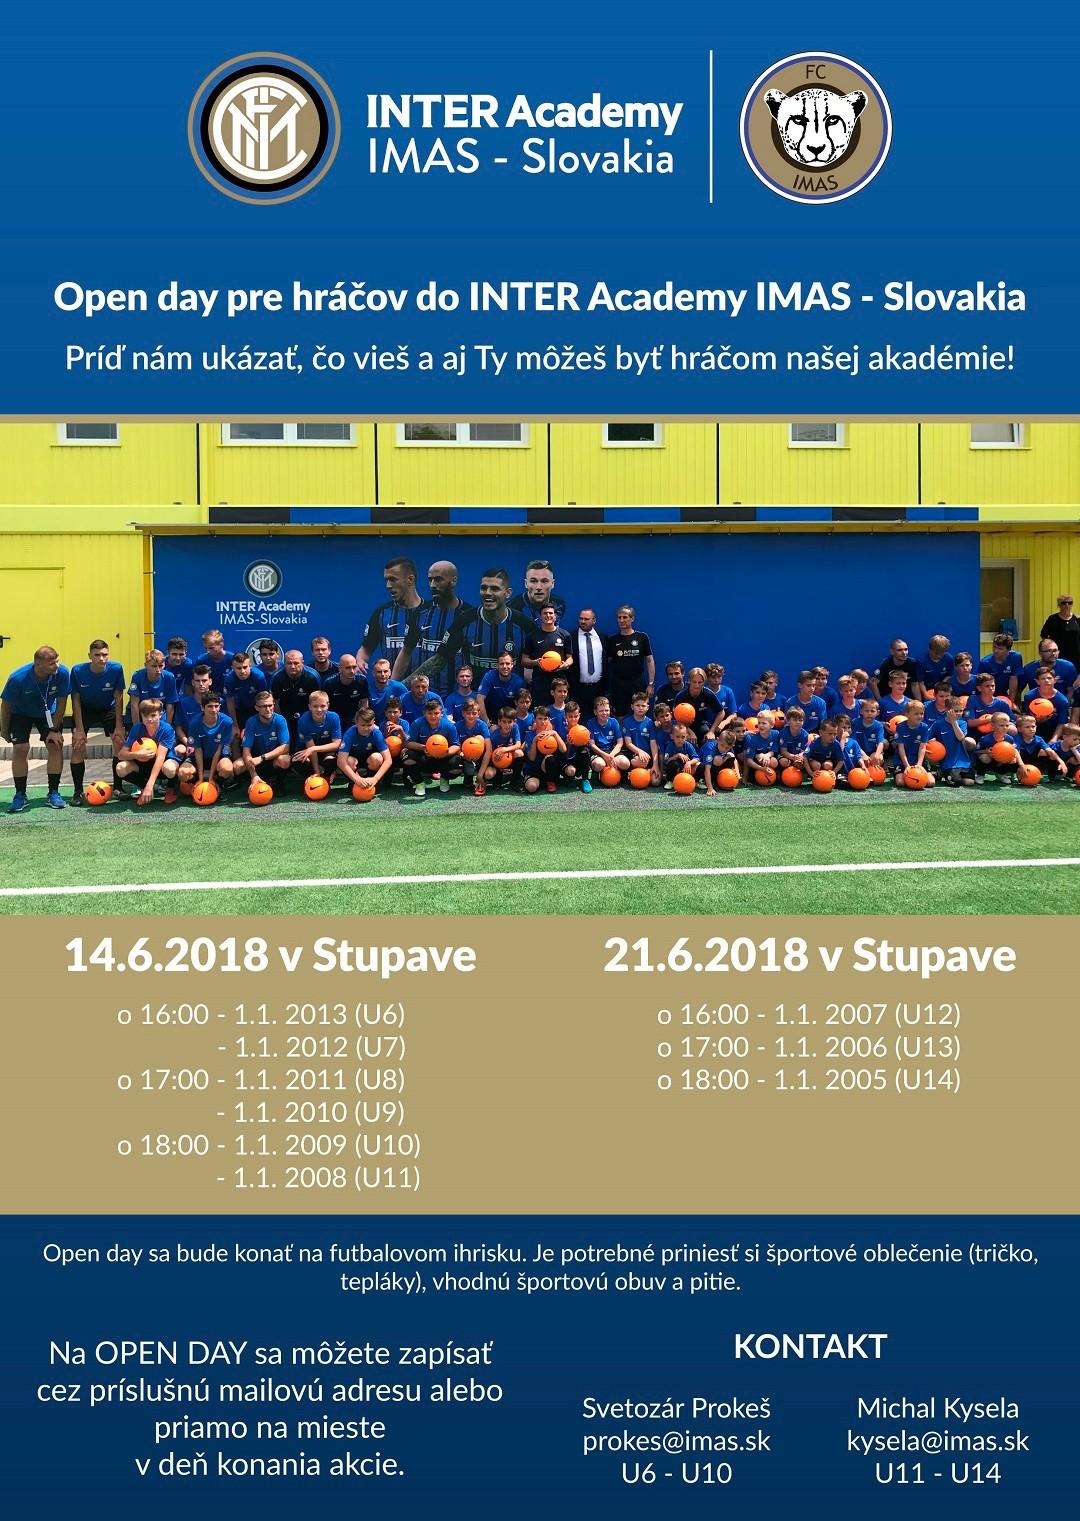 Inter Academy pozýva na tréningy mladých hráčov